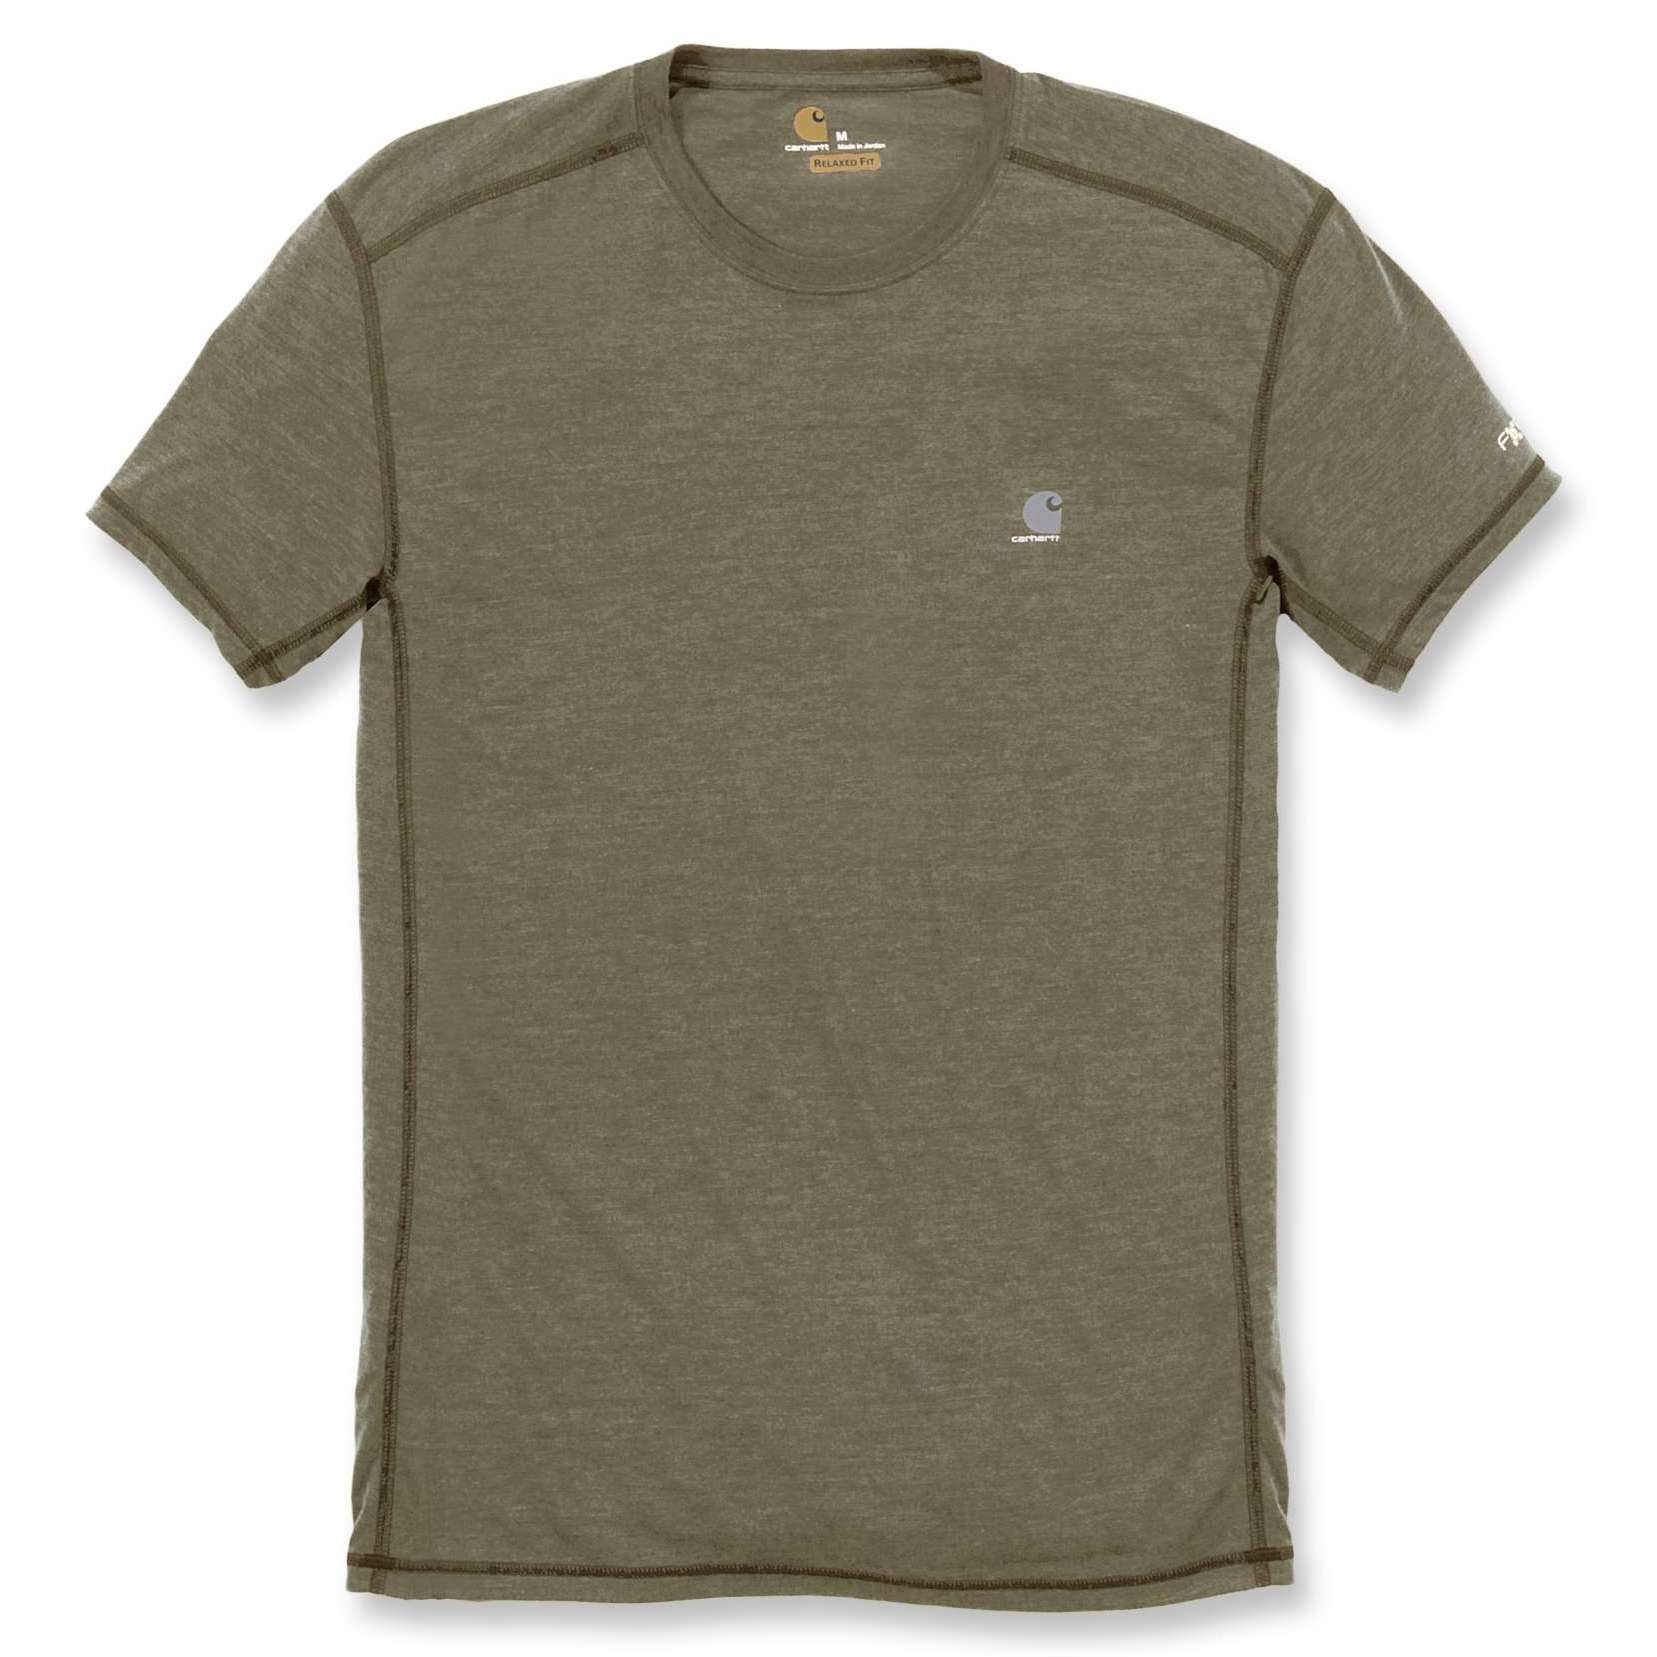 Футболка Carhartt Force Extremes T-Shirt S/S - 102960 (Burnt Olive Heather; L)